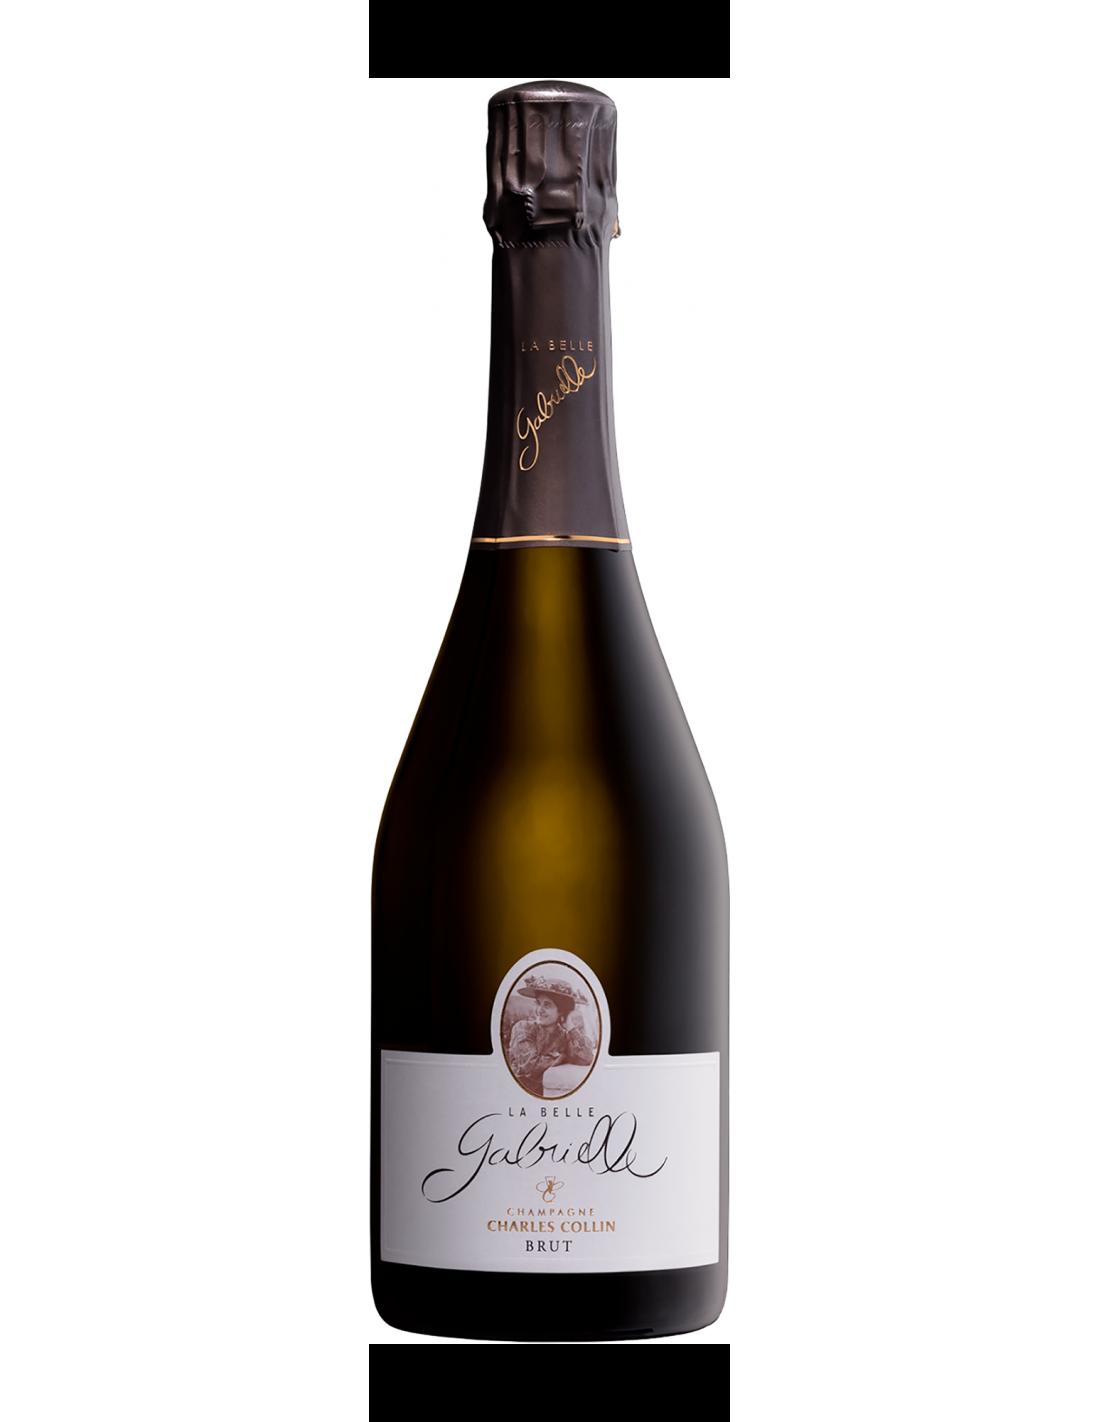 CHAMPAGNE BRUT LA BELLE GABRIELLE NV CHARLES COLLIN Grandi Bottiglie